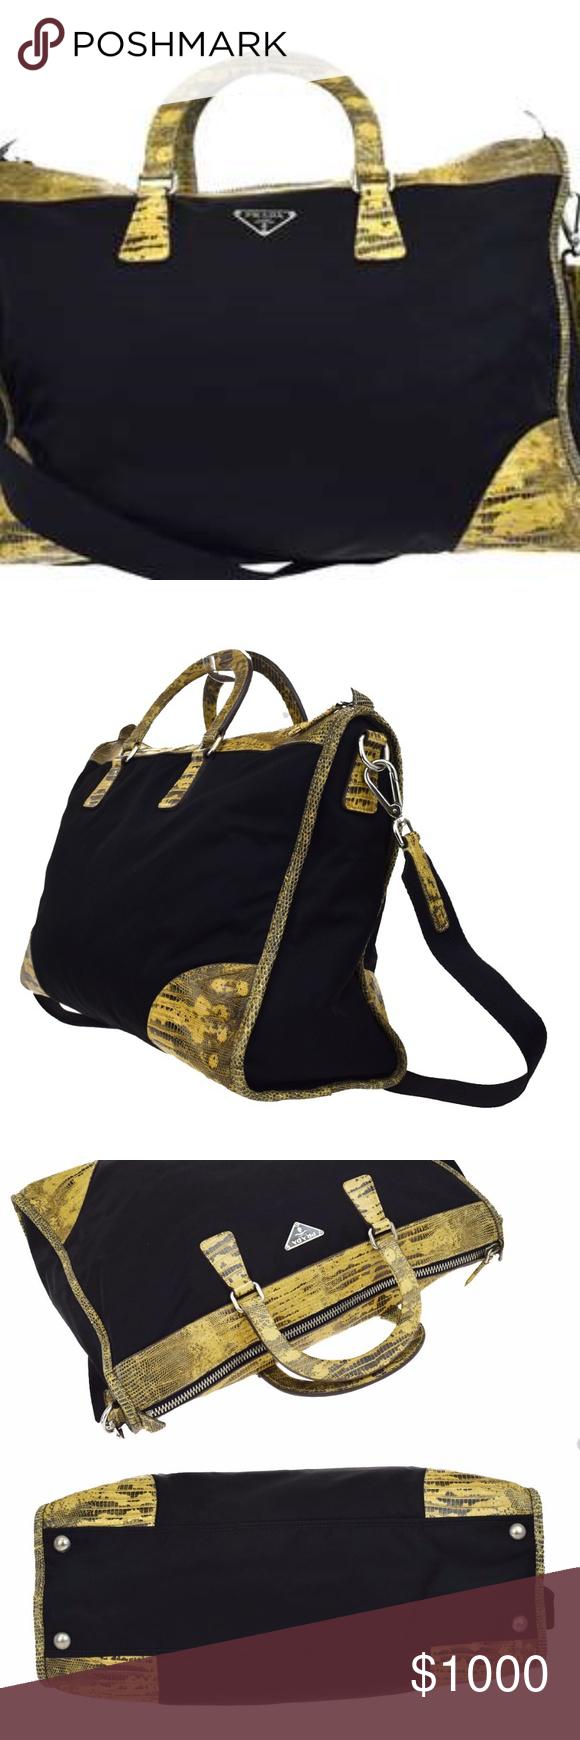 "971dae8d54c73d PRADA PURSE Authentic PRADA, 2Way-Shoulder Handbag Python Skin-Leather, bag  is Black nylon ""EXCELLENT CONDITION"" 1 Zipper to close and secure your  items, ..."